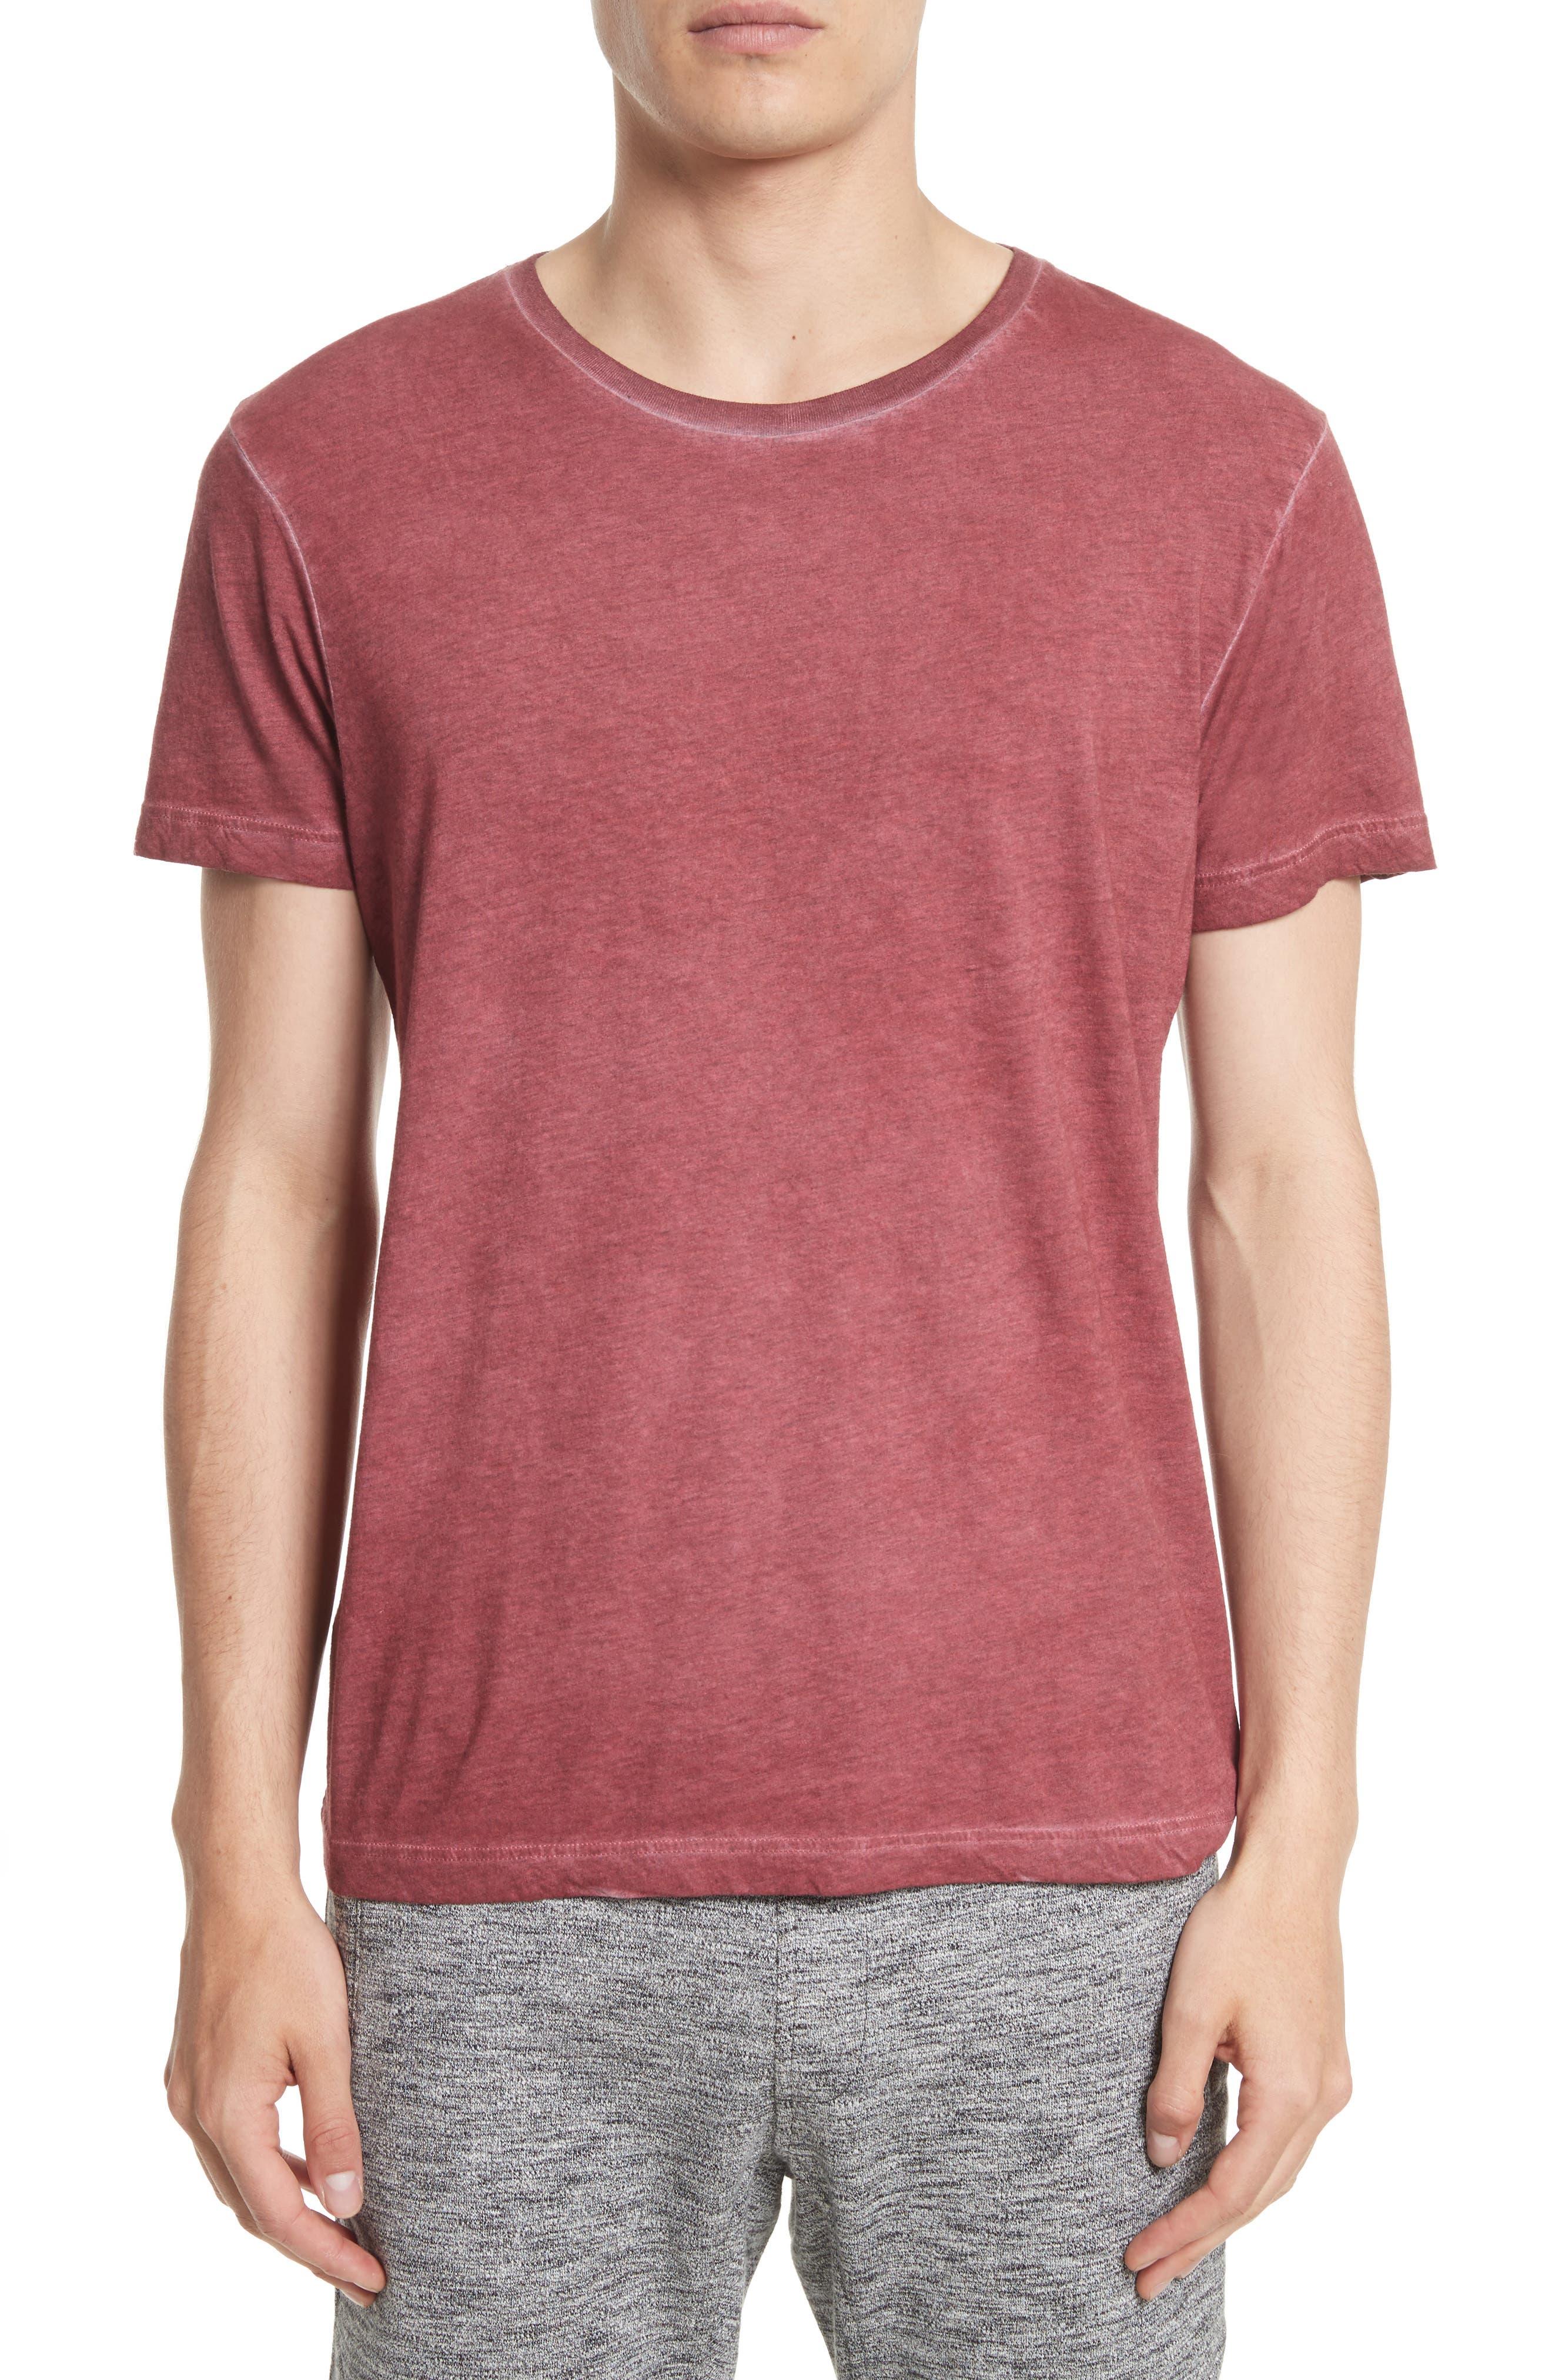 Main Image - Belstaff 'Trafford' Cotton Crewneck T-Shirt